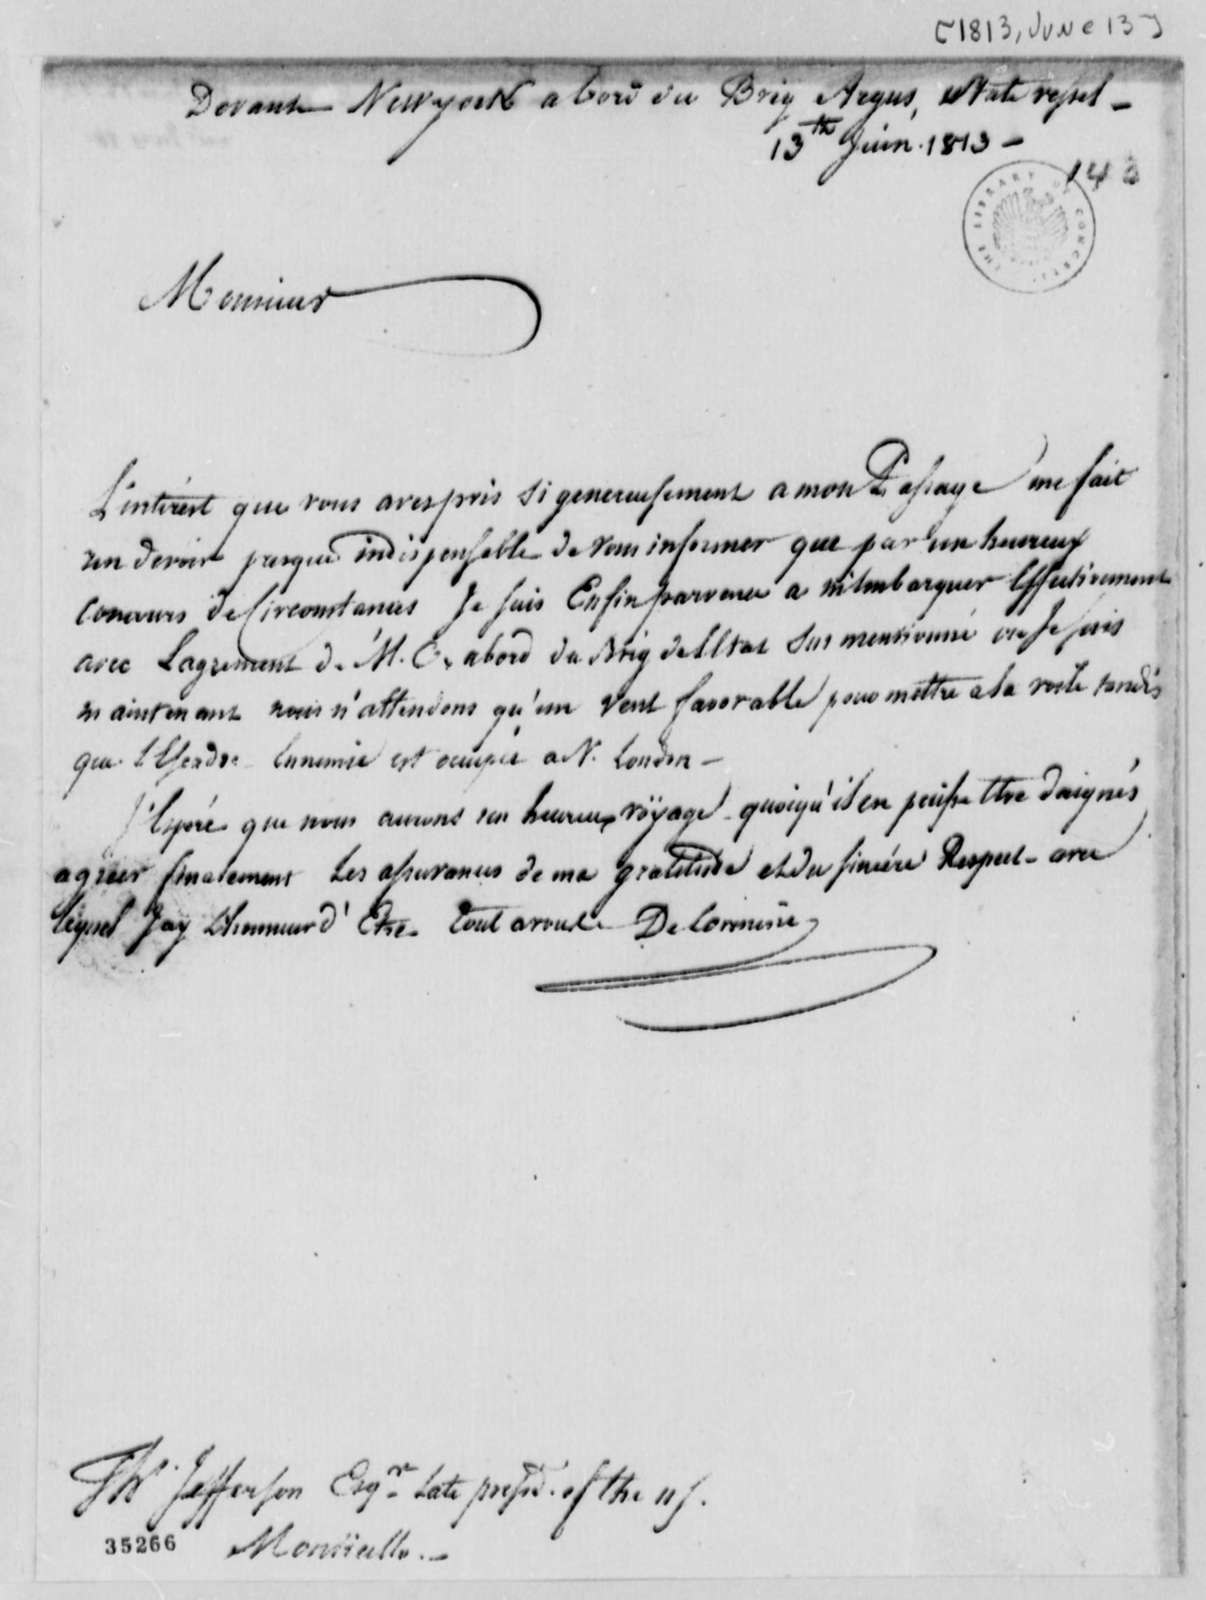 De Lormerie to Thomas Jefferson, June 13, 1813, in French